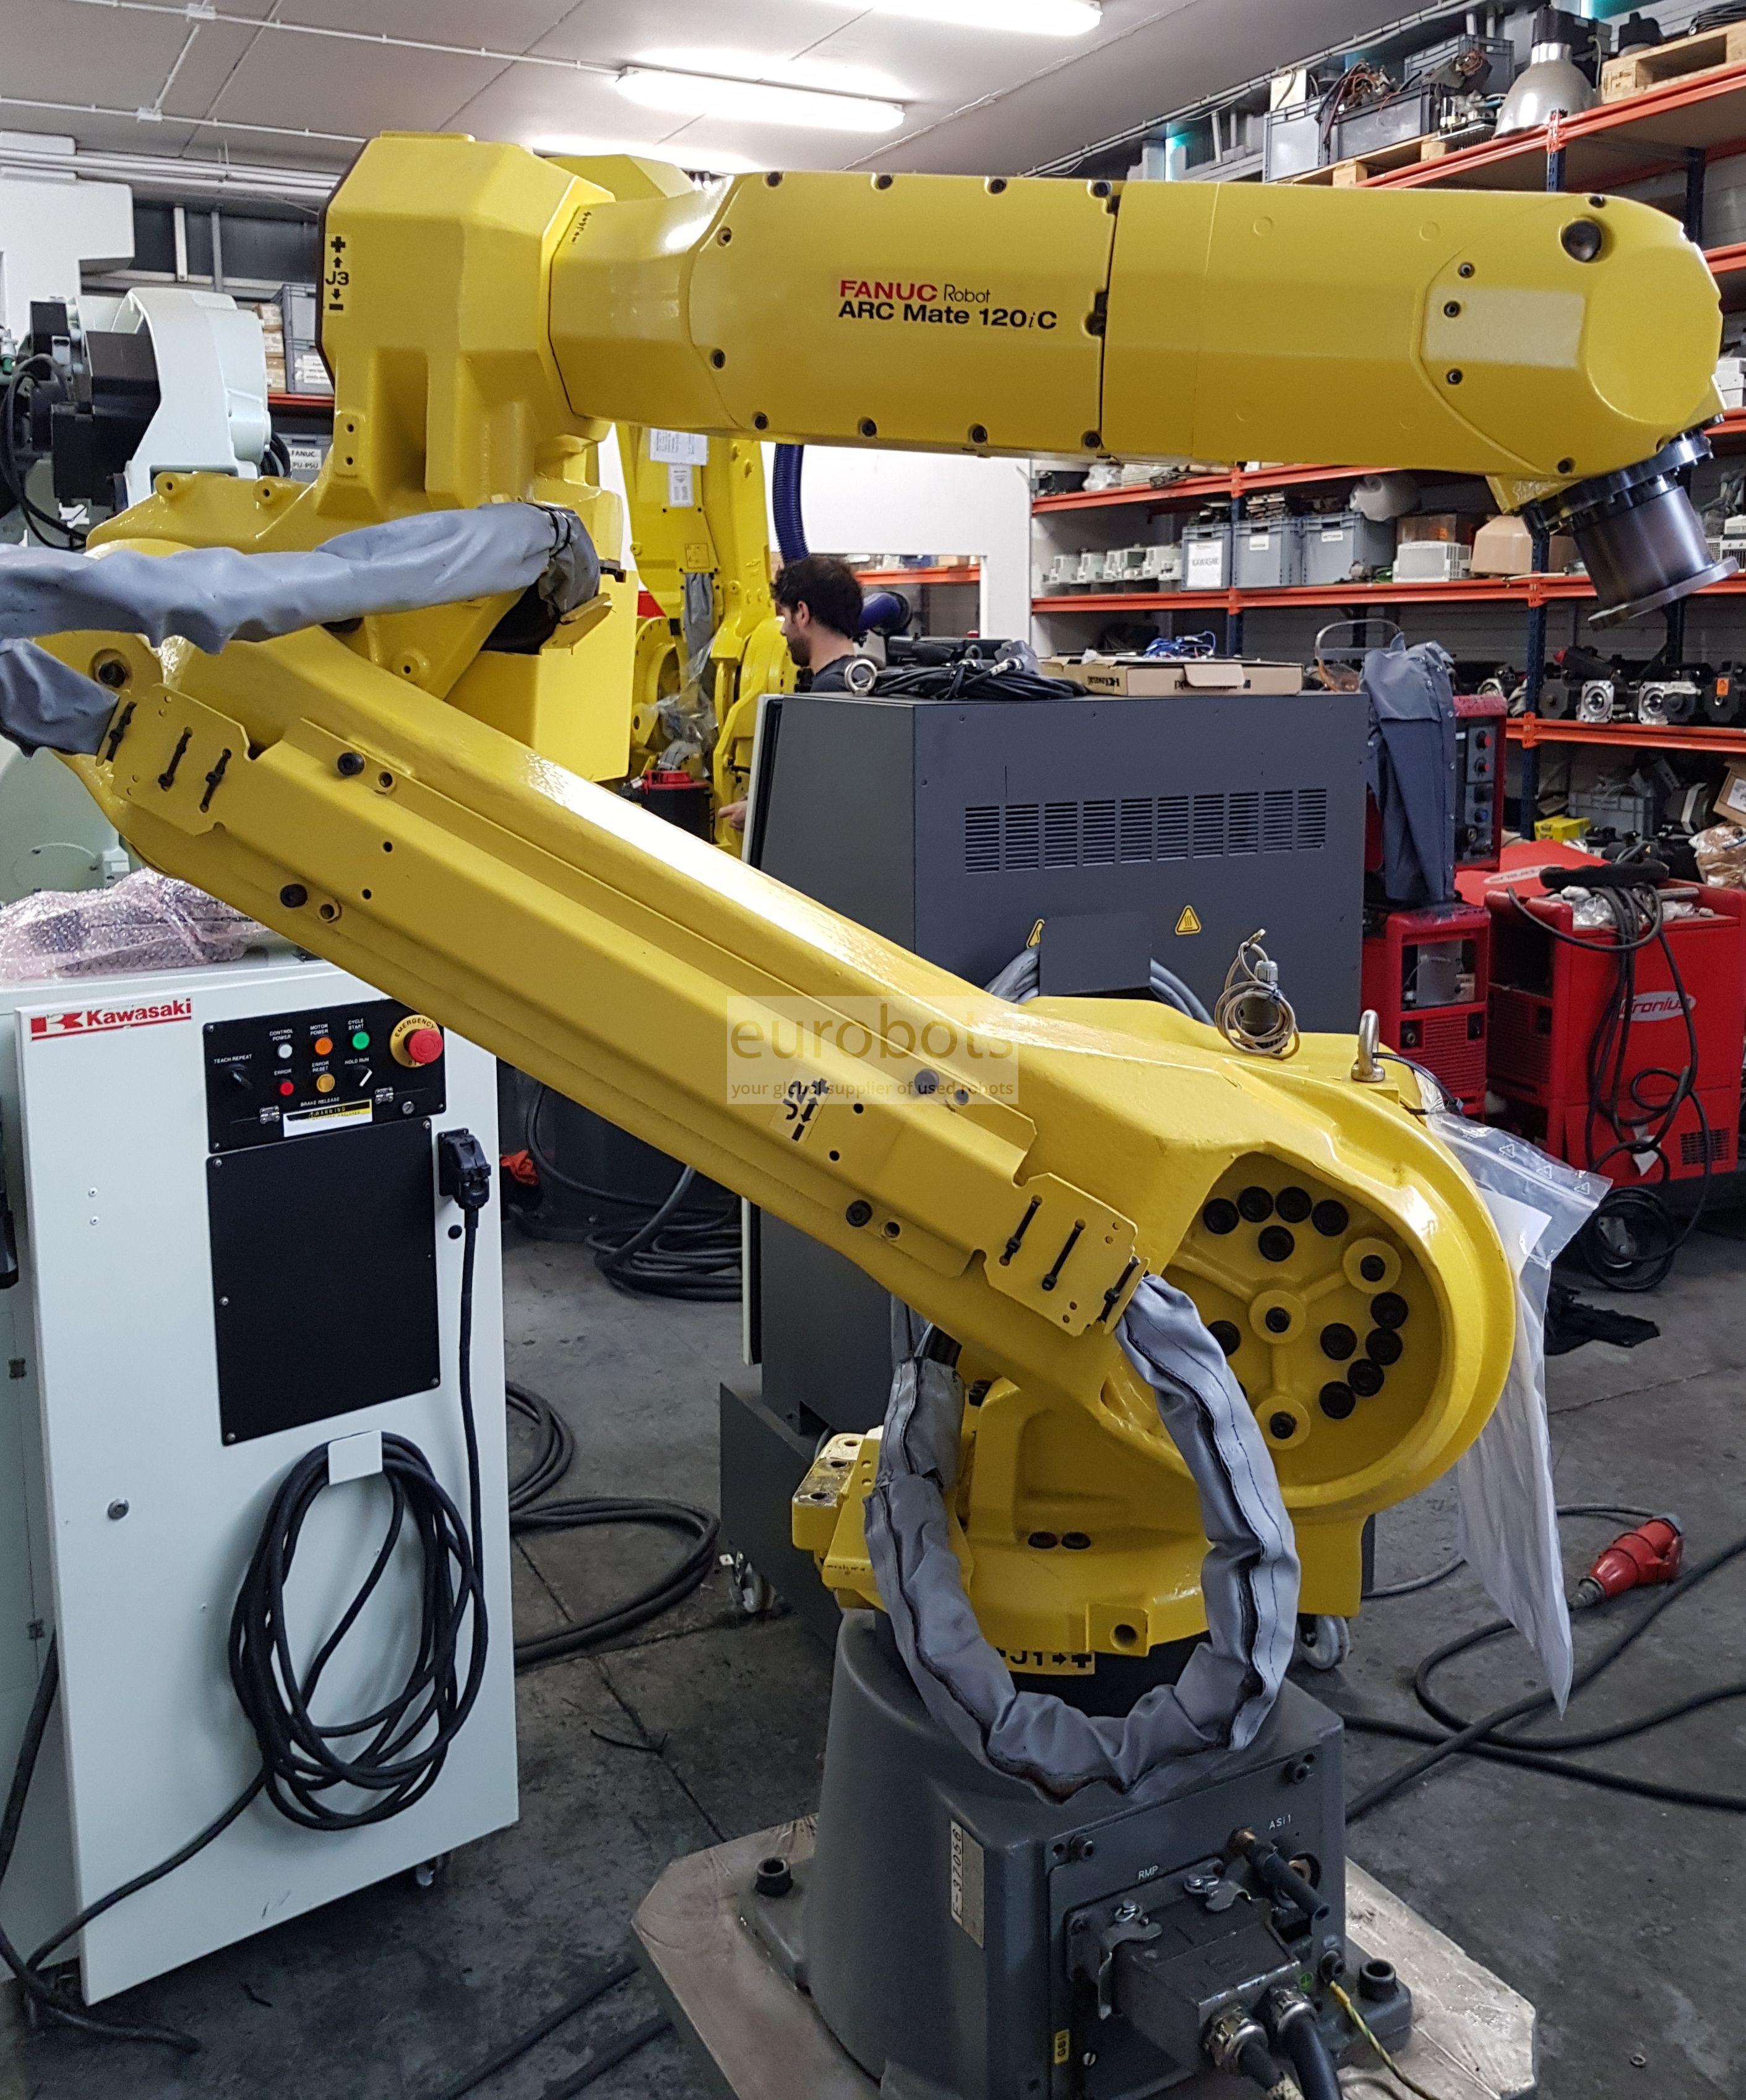 Used Fanuc robot arc mate 120ic R-30ia contoller | Eurobots